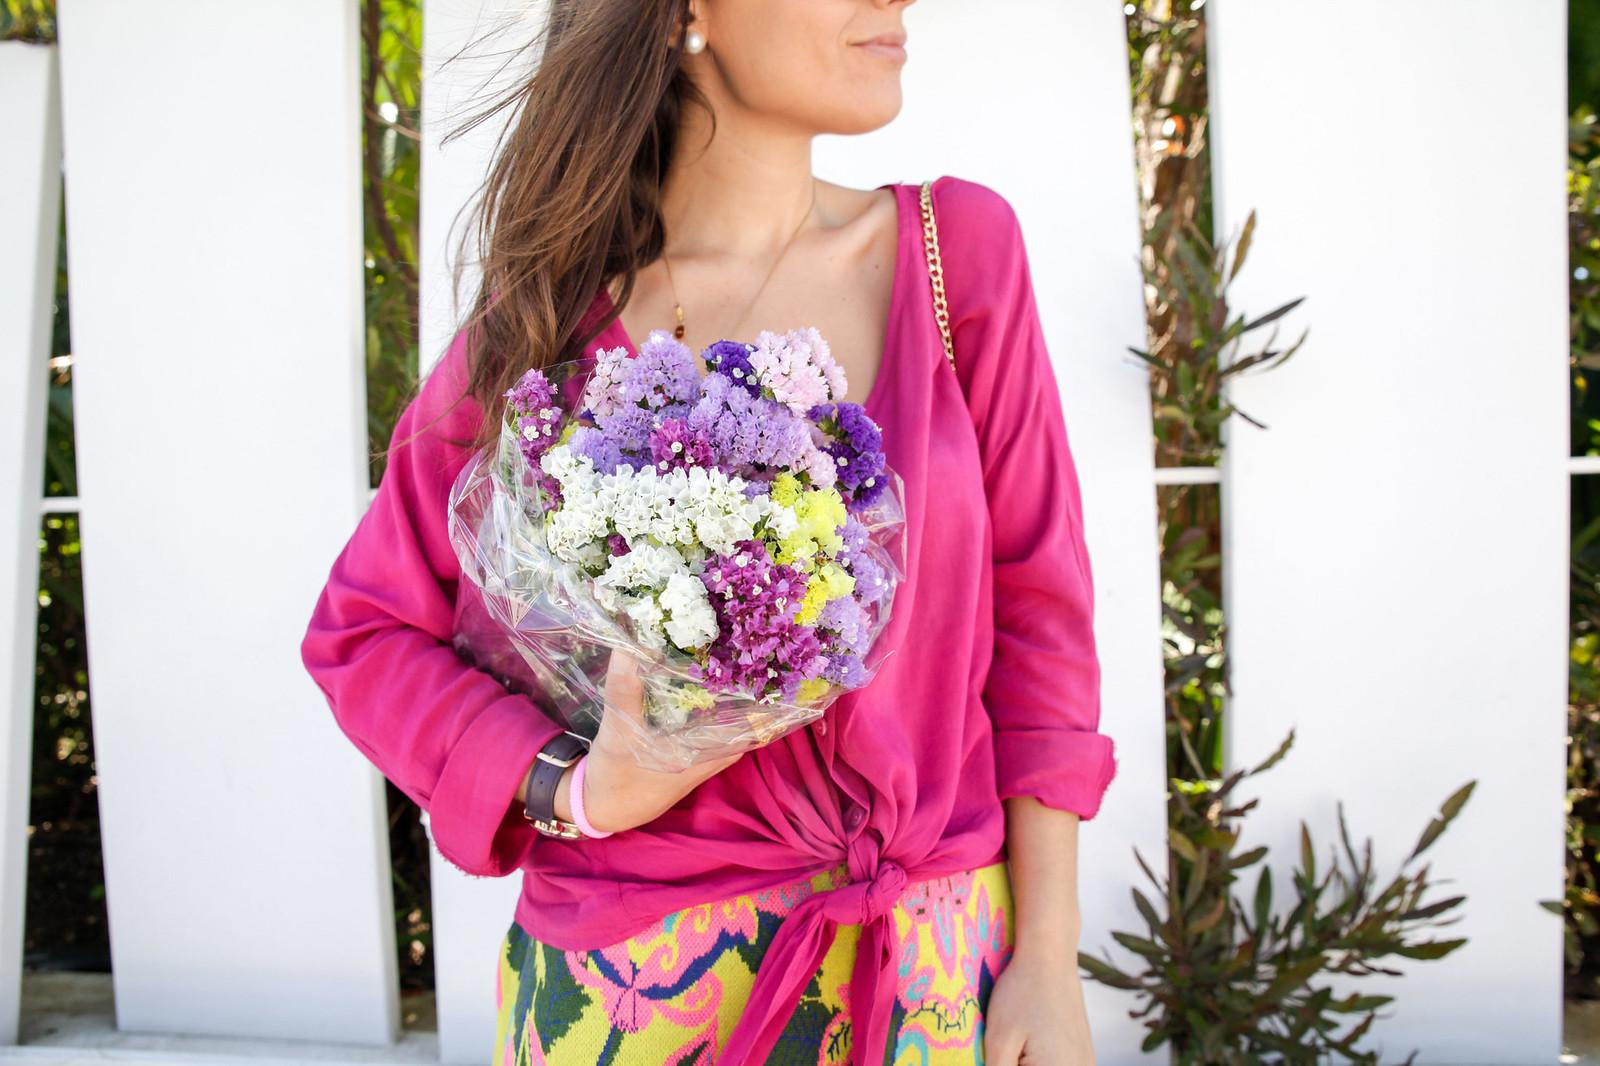 012_blusa_magenta_falda_amarilla_outfit_ruga_summer17_theguestgirl_influencer_barcelona_portugal_brand_ambassador